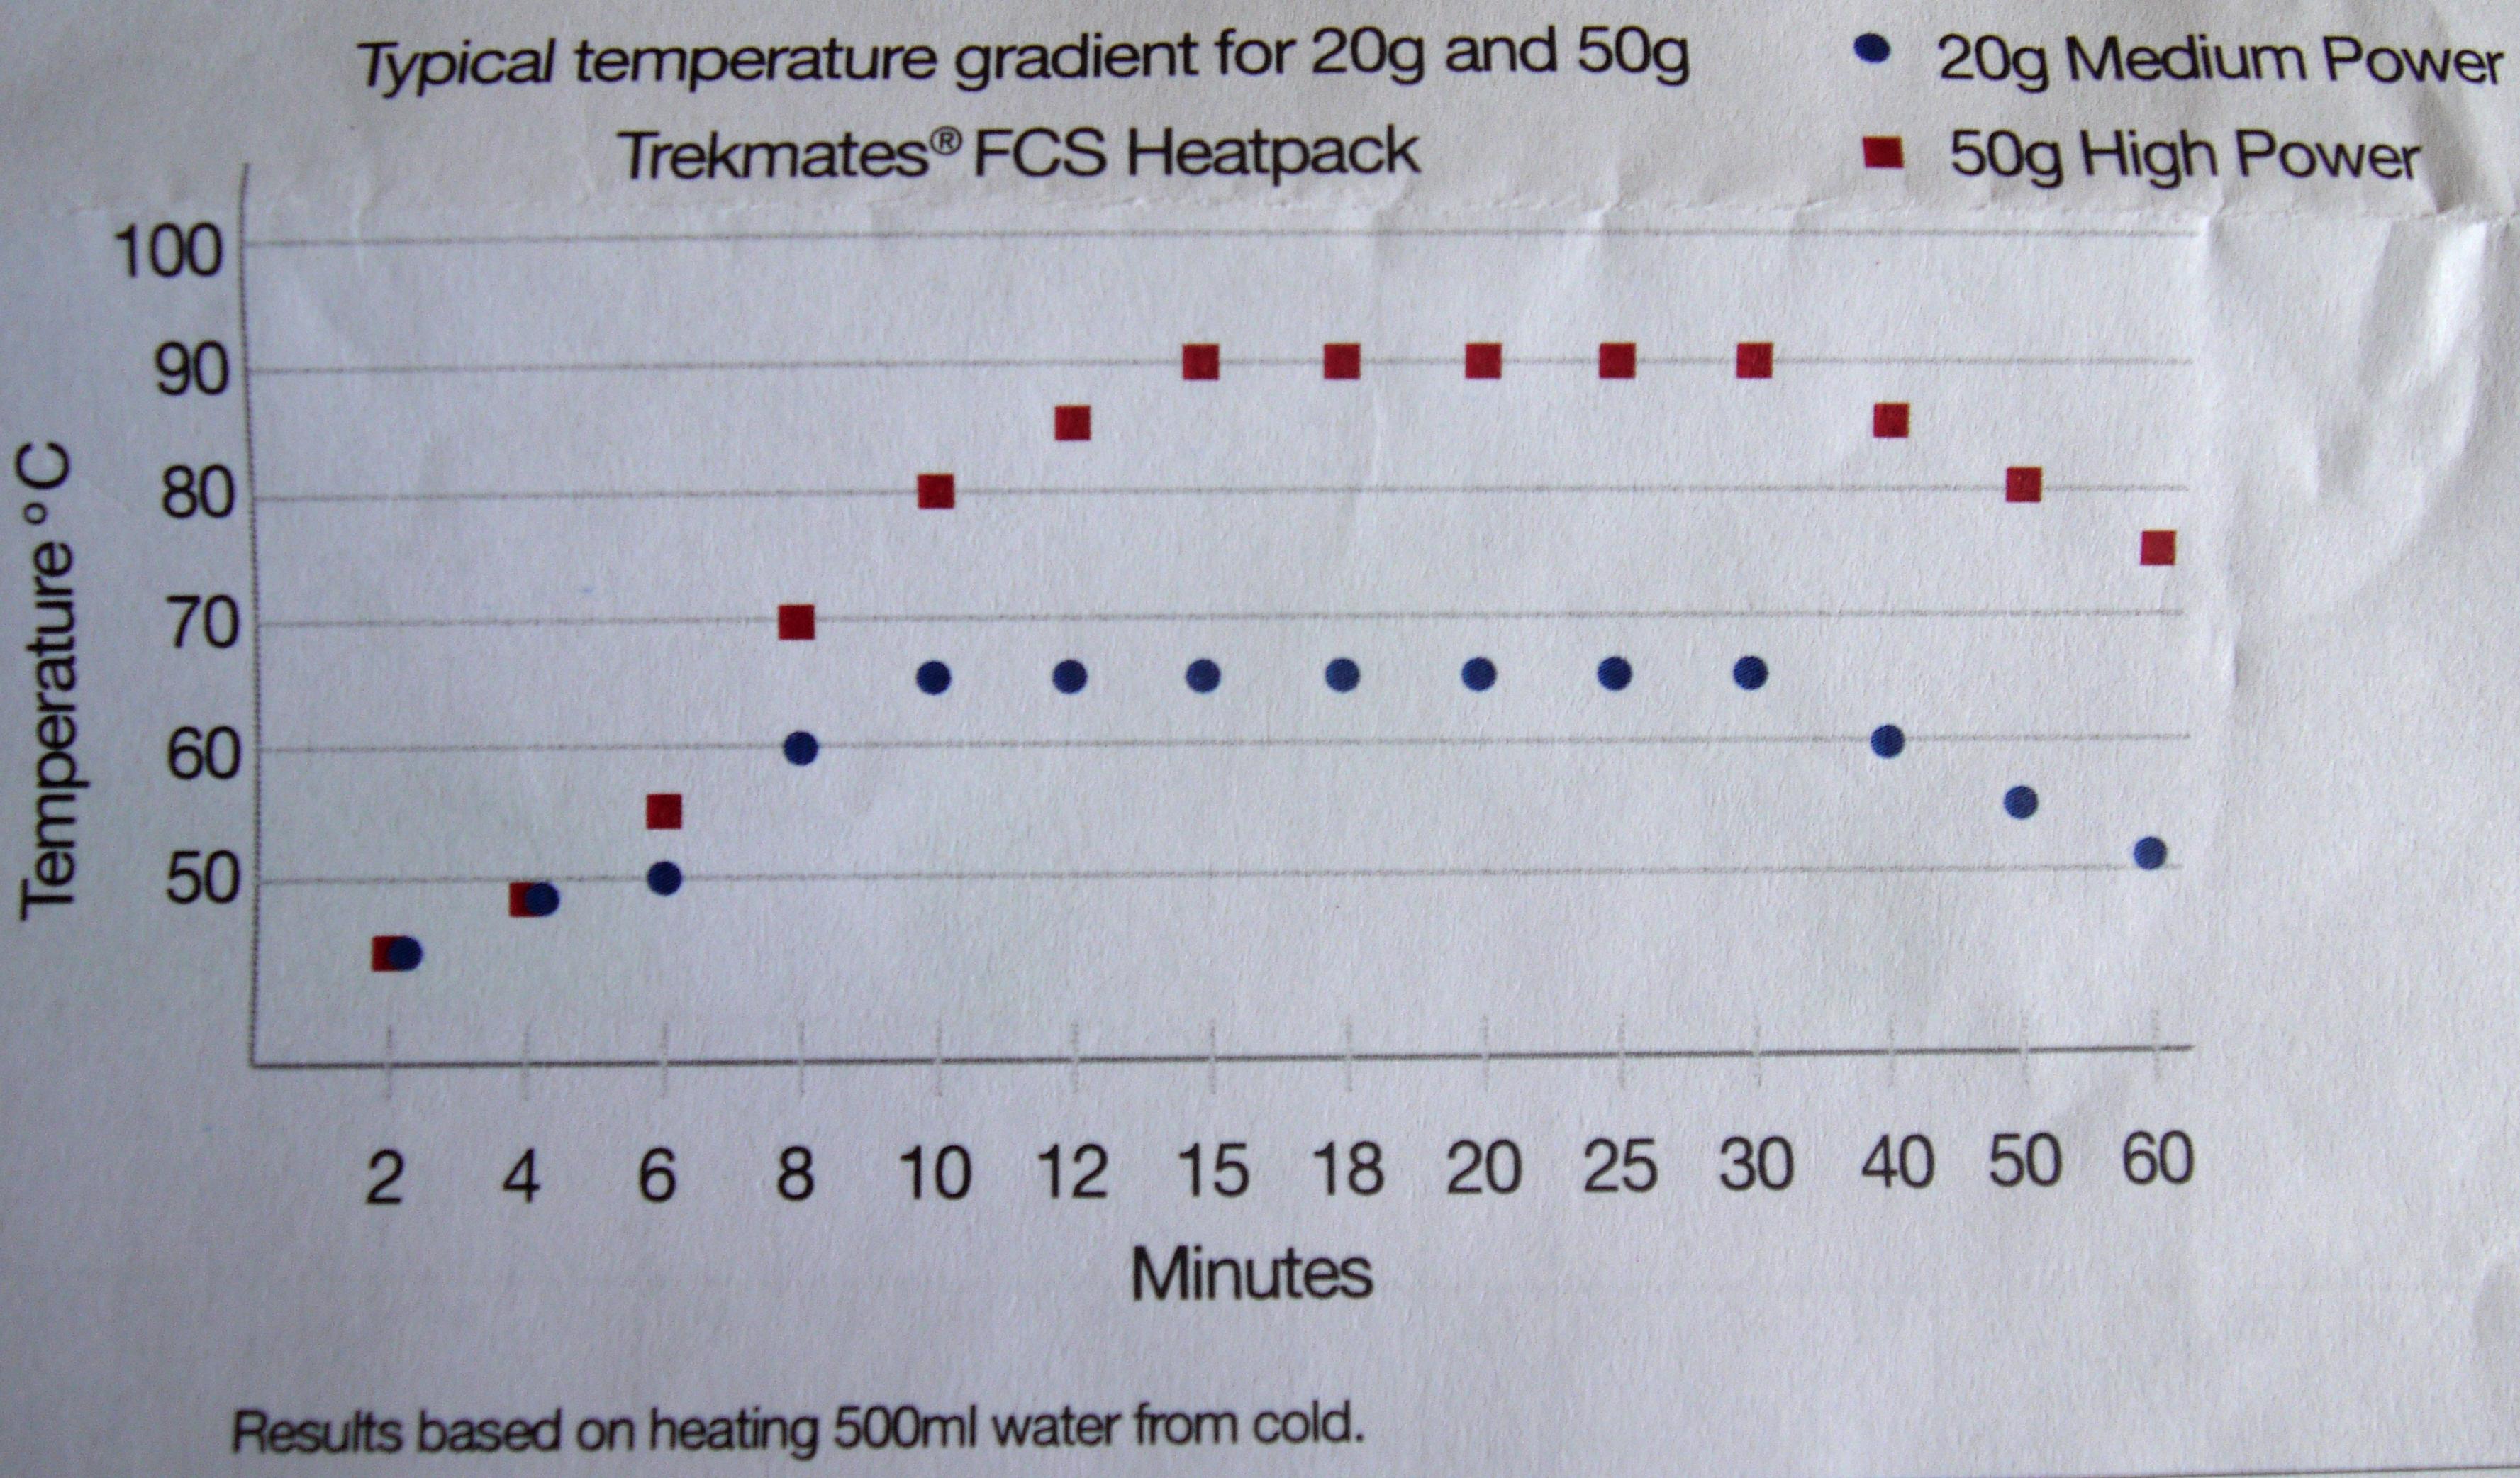 Heating stats